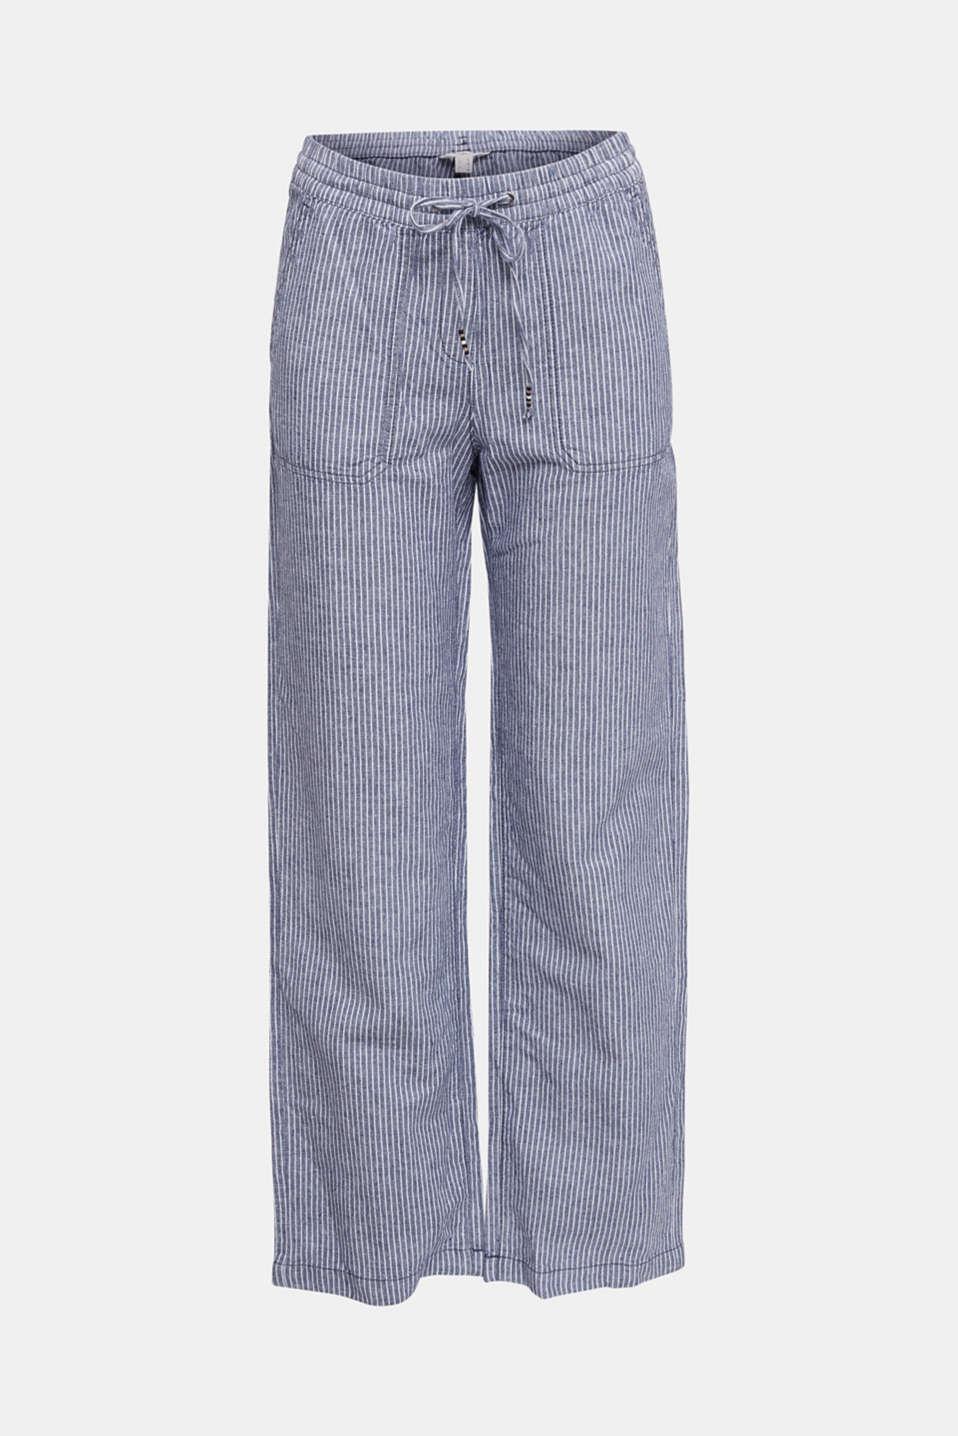 Trousers, DARK BLUE 3, detail image number 7